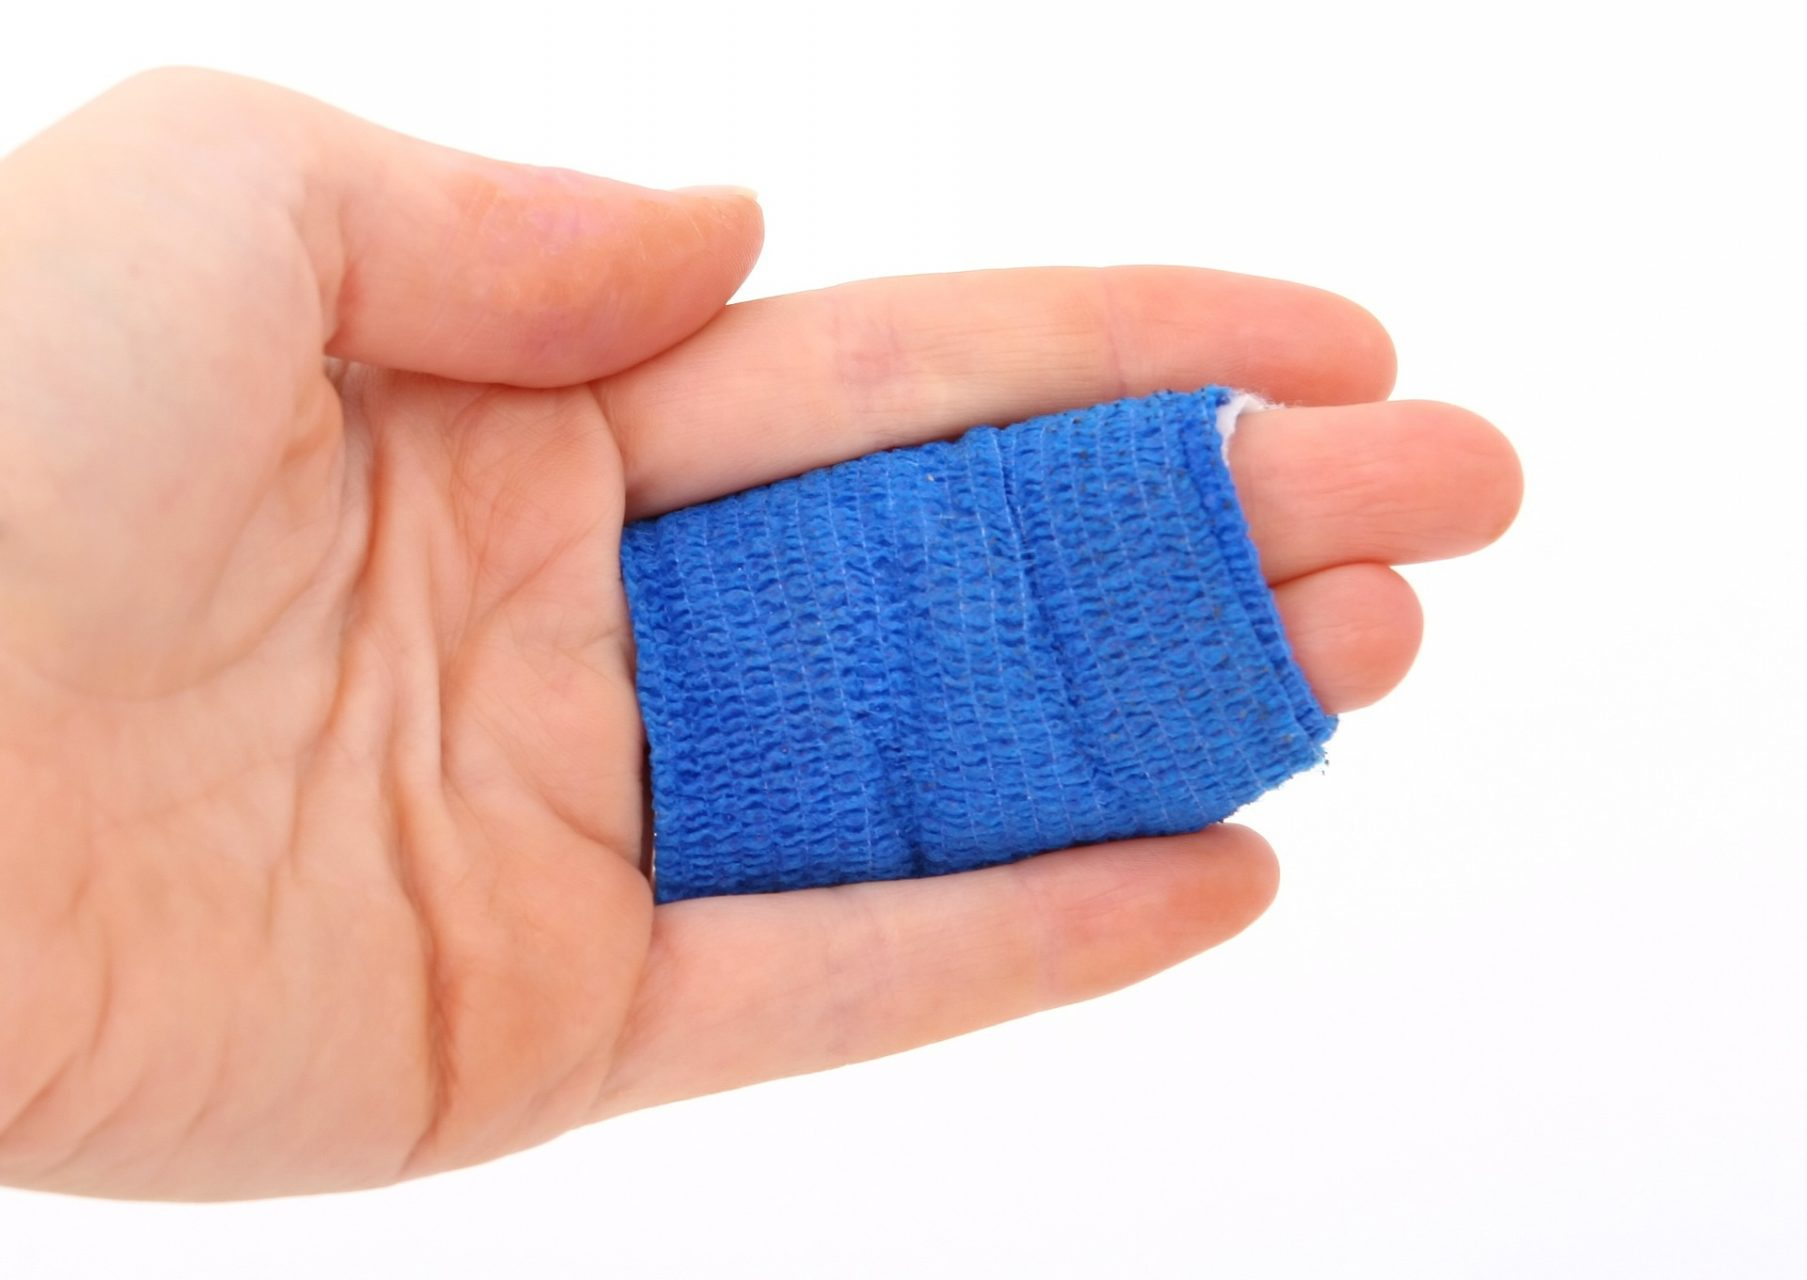 Kako pravilno imobilizirati i sto je to uopce Imobilizacija kod povrede ili loma